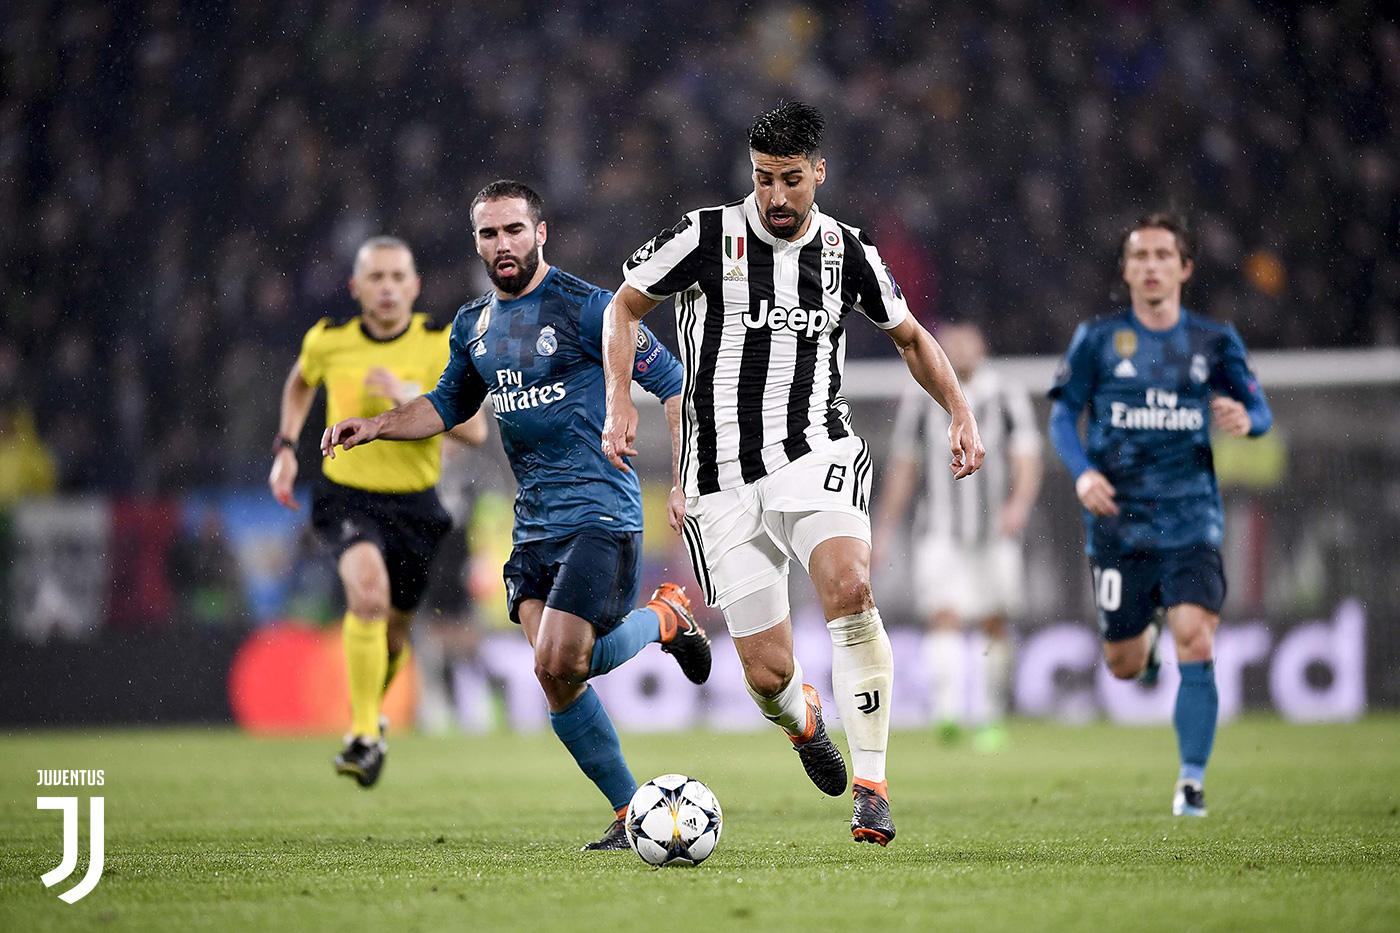 CALCIO Juventus-Real Madrid 0-3